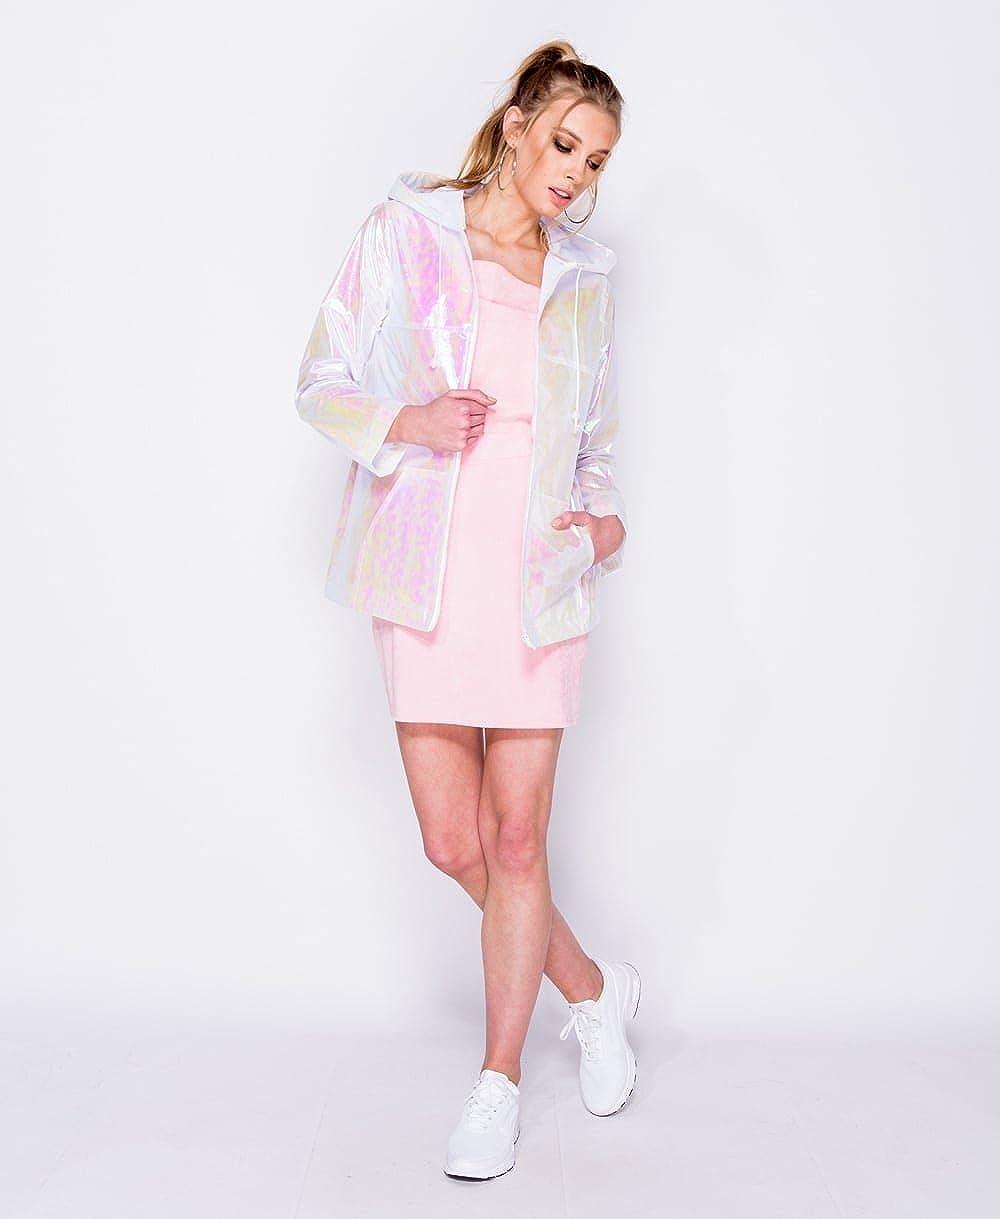 Instagram Clothing - Chaqueta - Parka - Manga Larga - para mujer Rosa rosa 40: Amazon.es: Ropa y accesorios